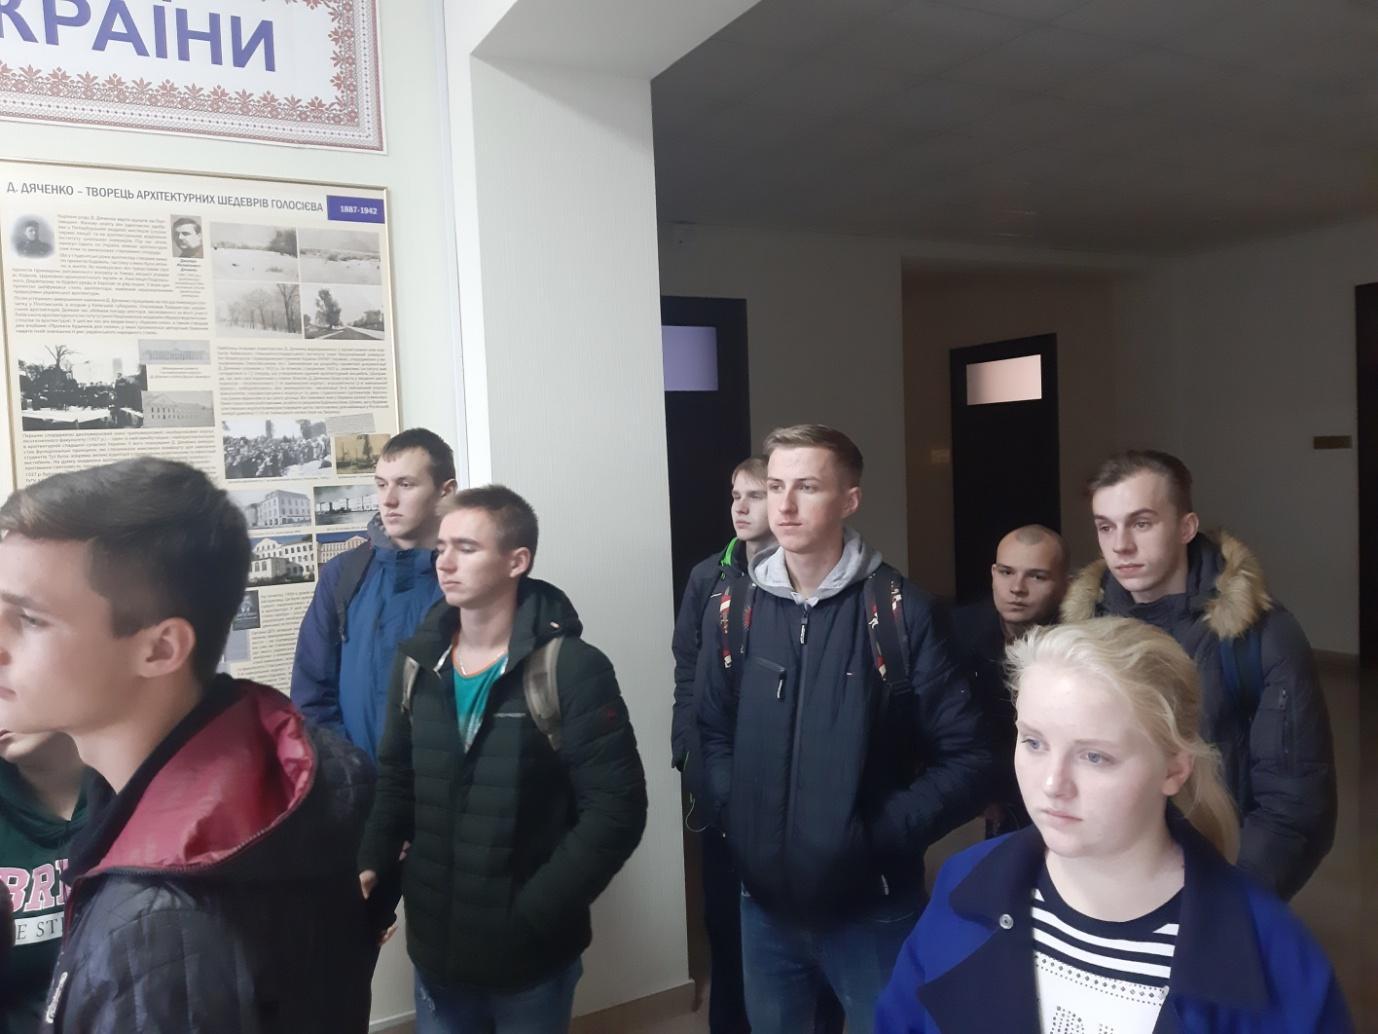 P:\На сайт НУБіП України\Музей нубіп\20191030_150711.jpg